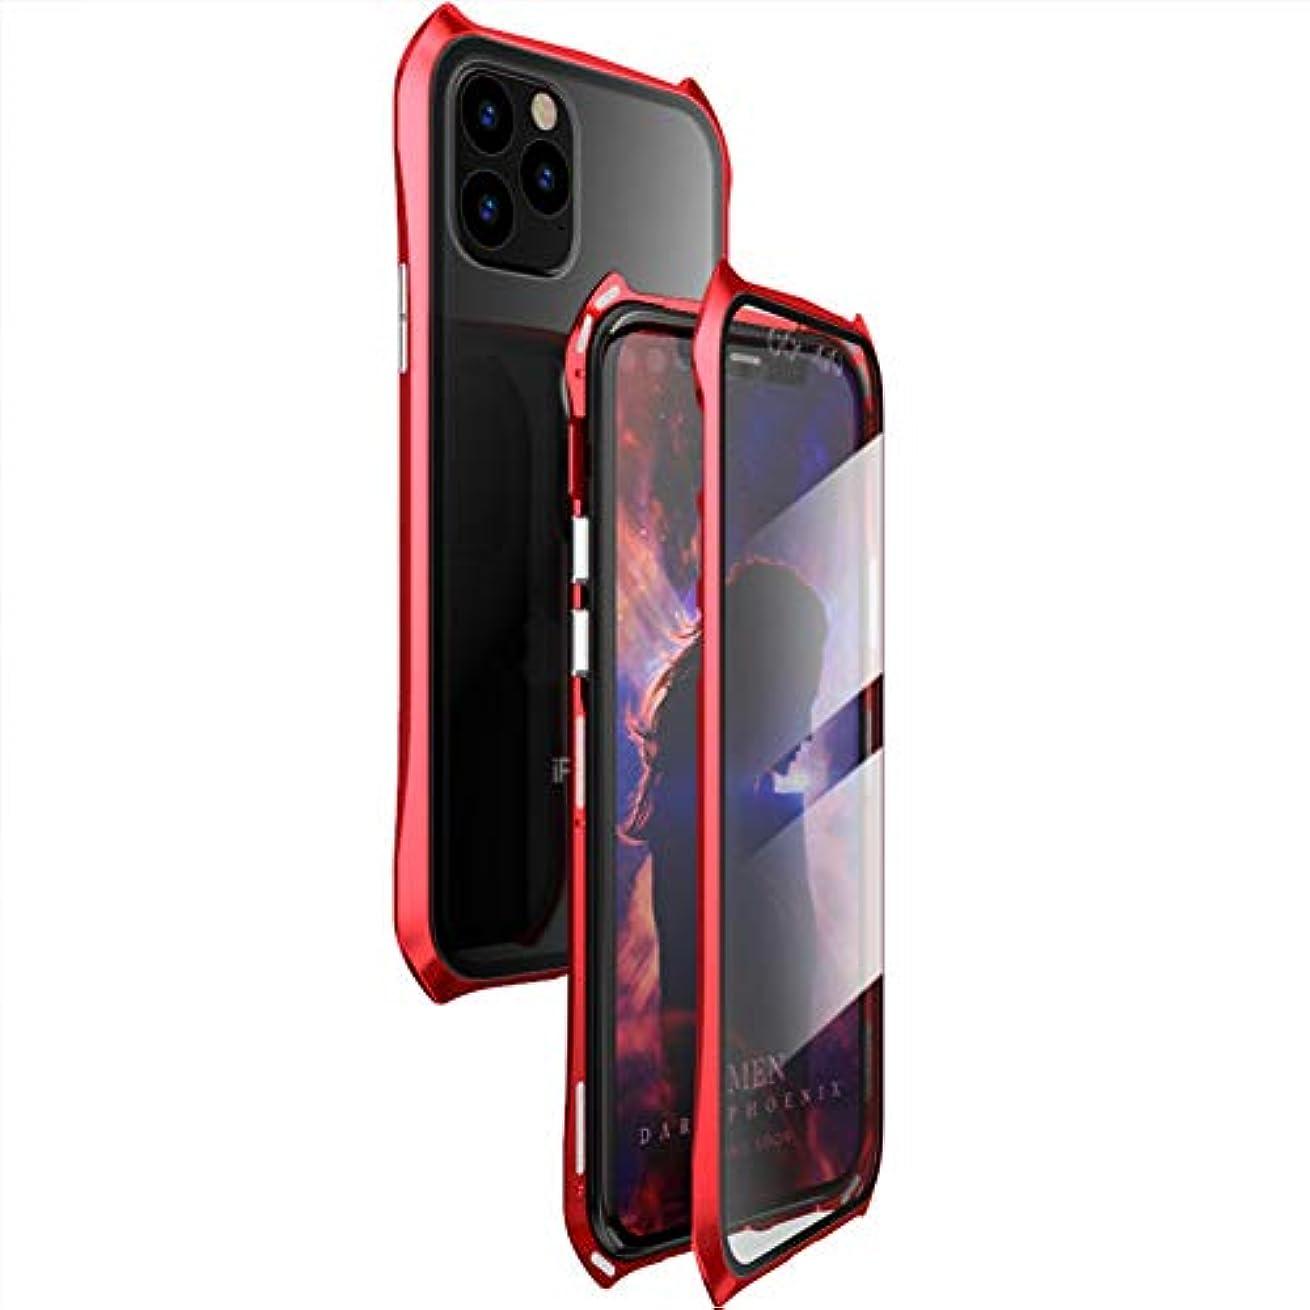 Iphone 保護カバー - 携帯電話シェル両面ガラス磁気キングアップル11保護カバーオールインクルーシブアンチフォール男性と女性の